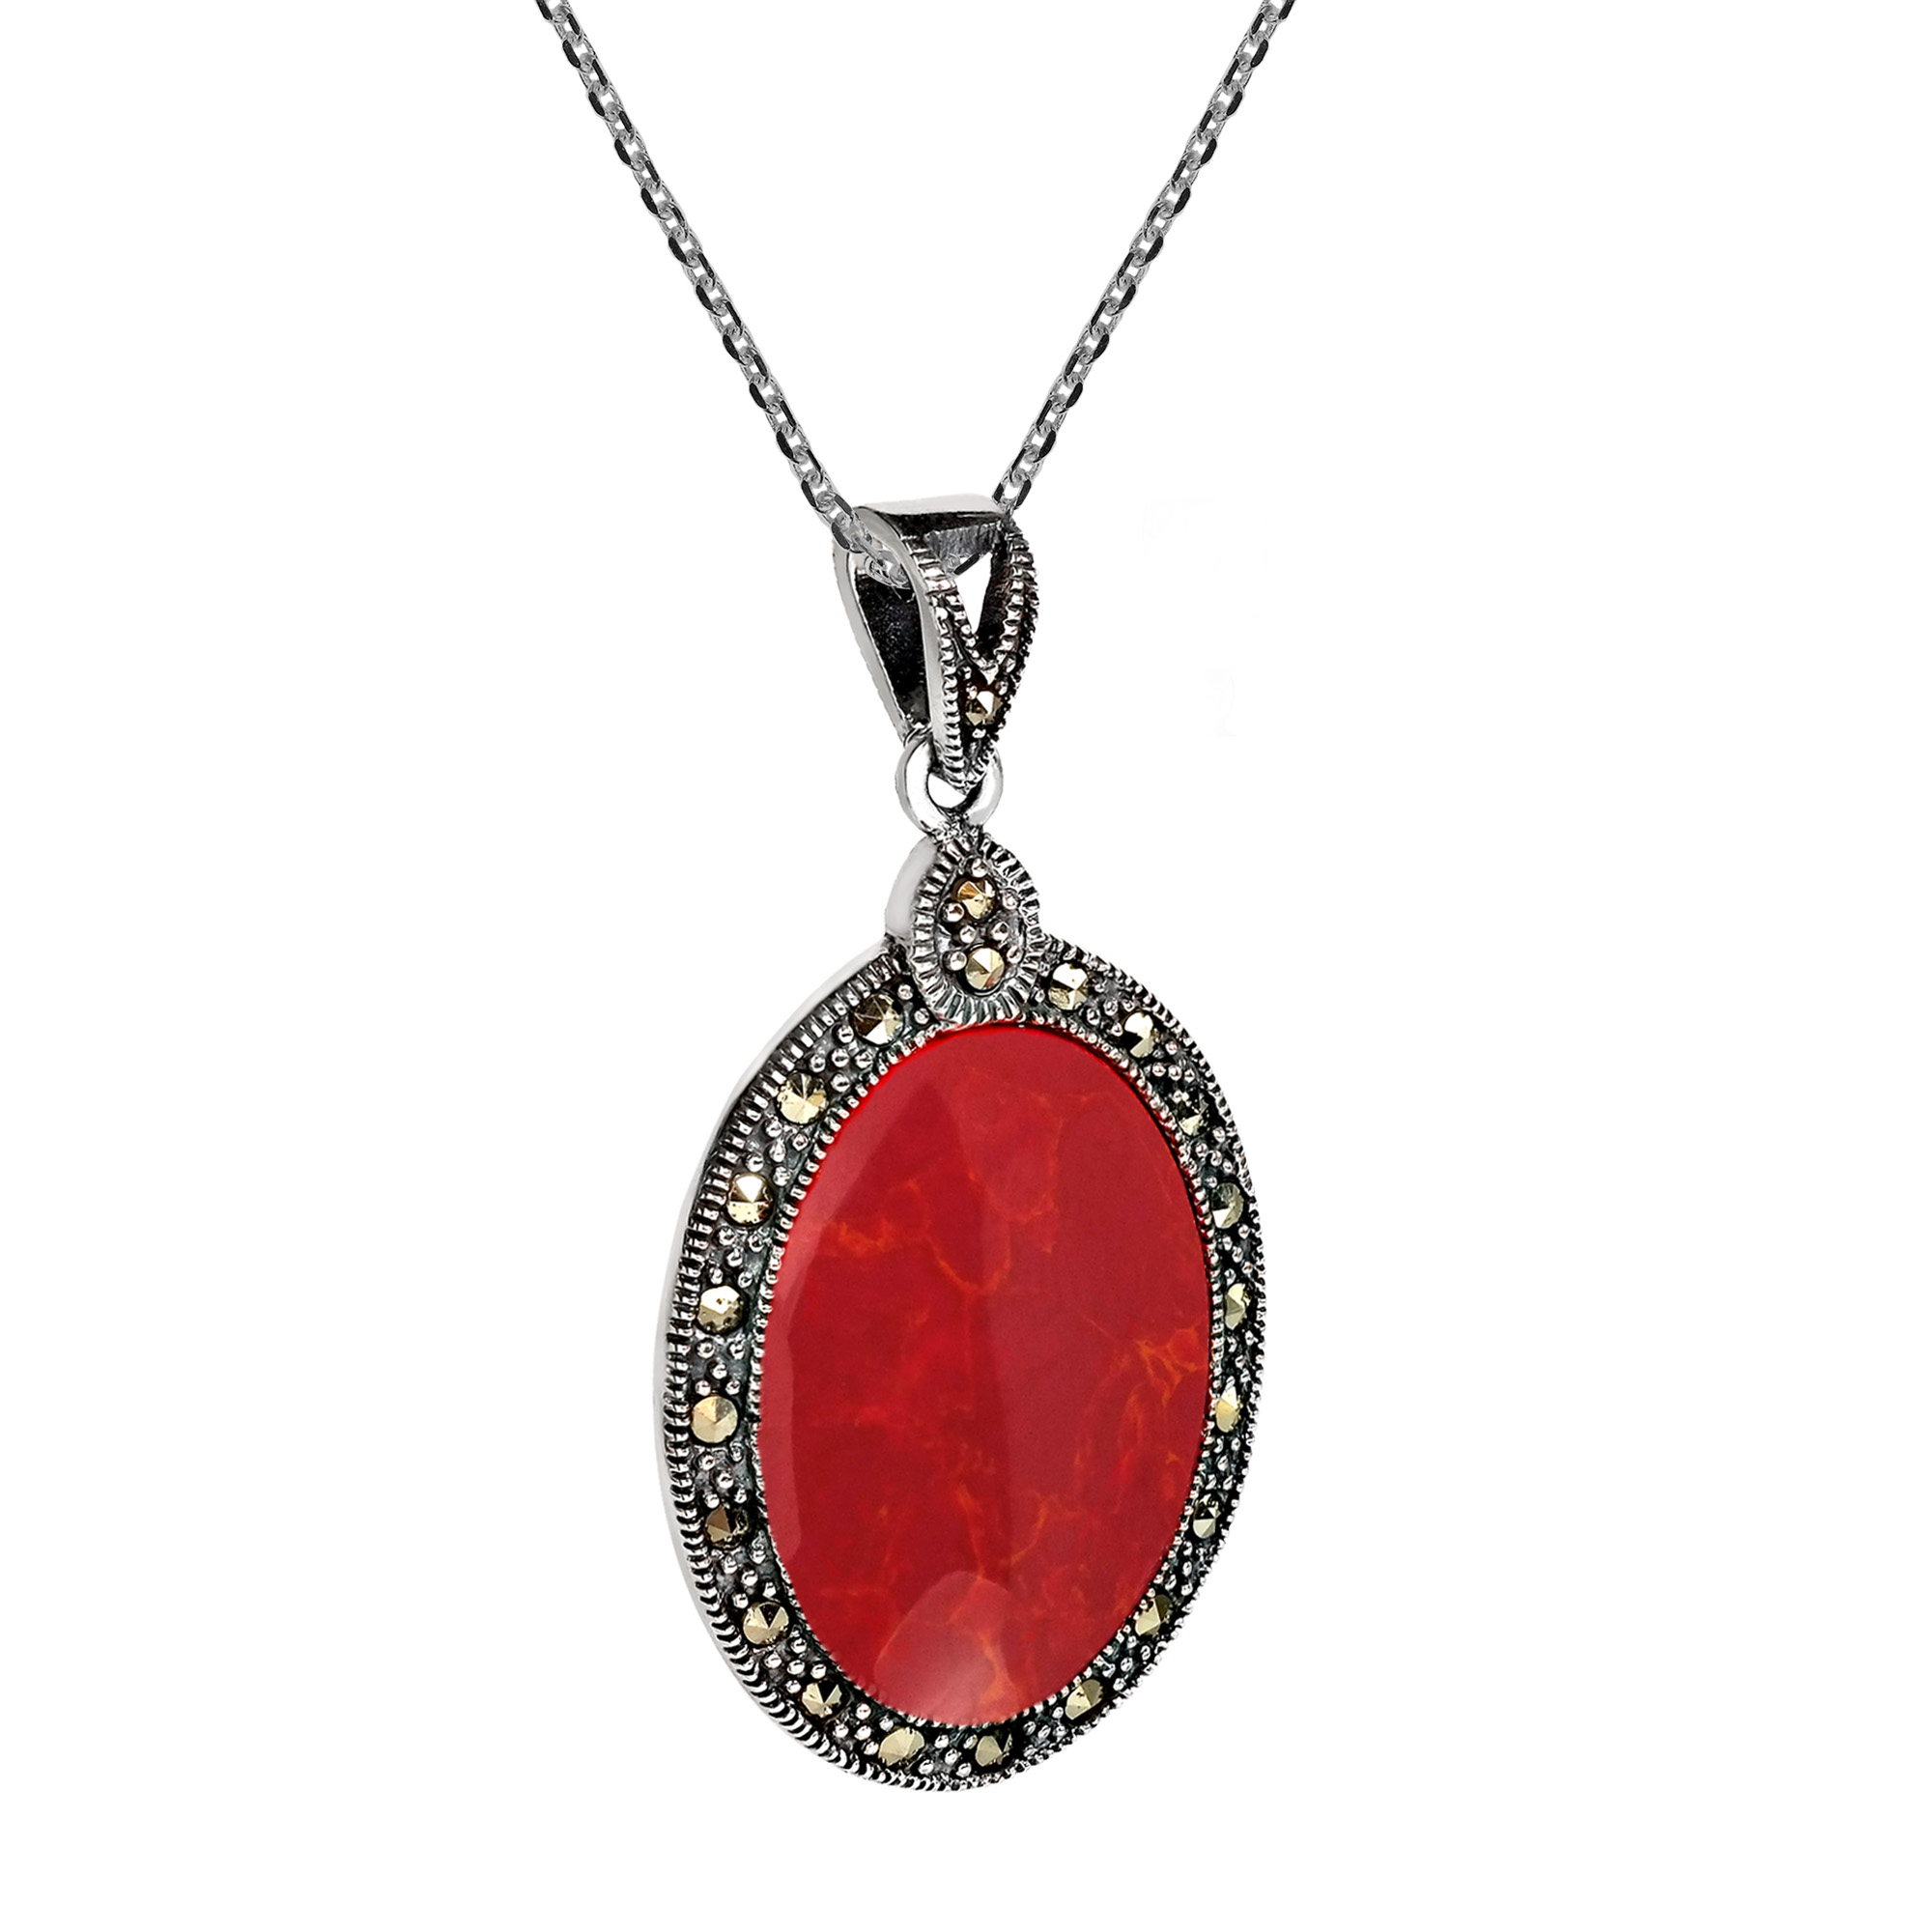 Vintage Inspired Oval Red Coral Marcasite Frame Sterling